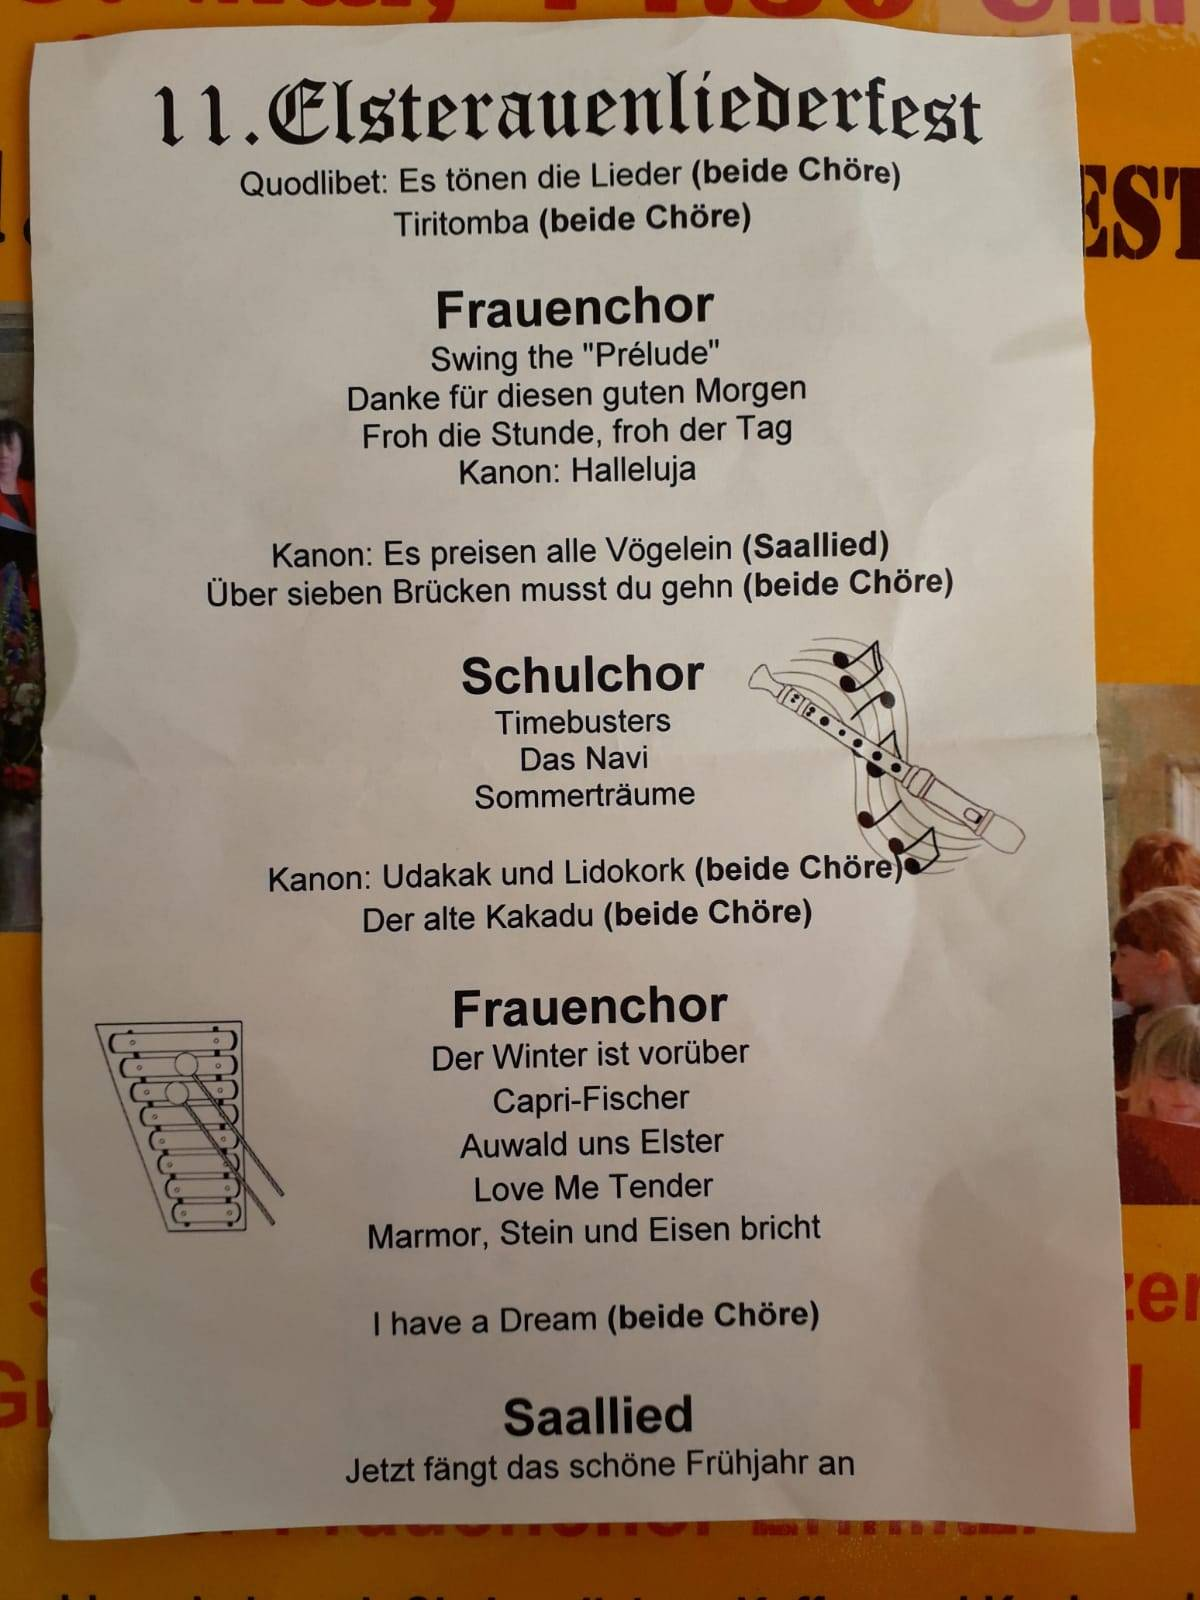 185 Elsterauen Liederfest Raßnitz